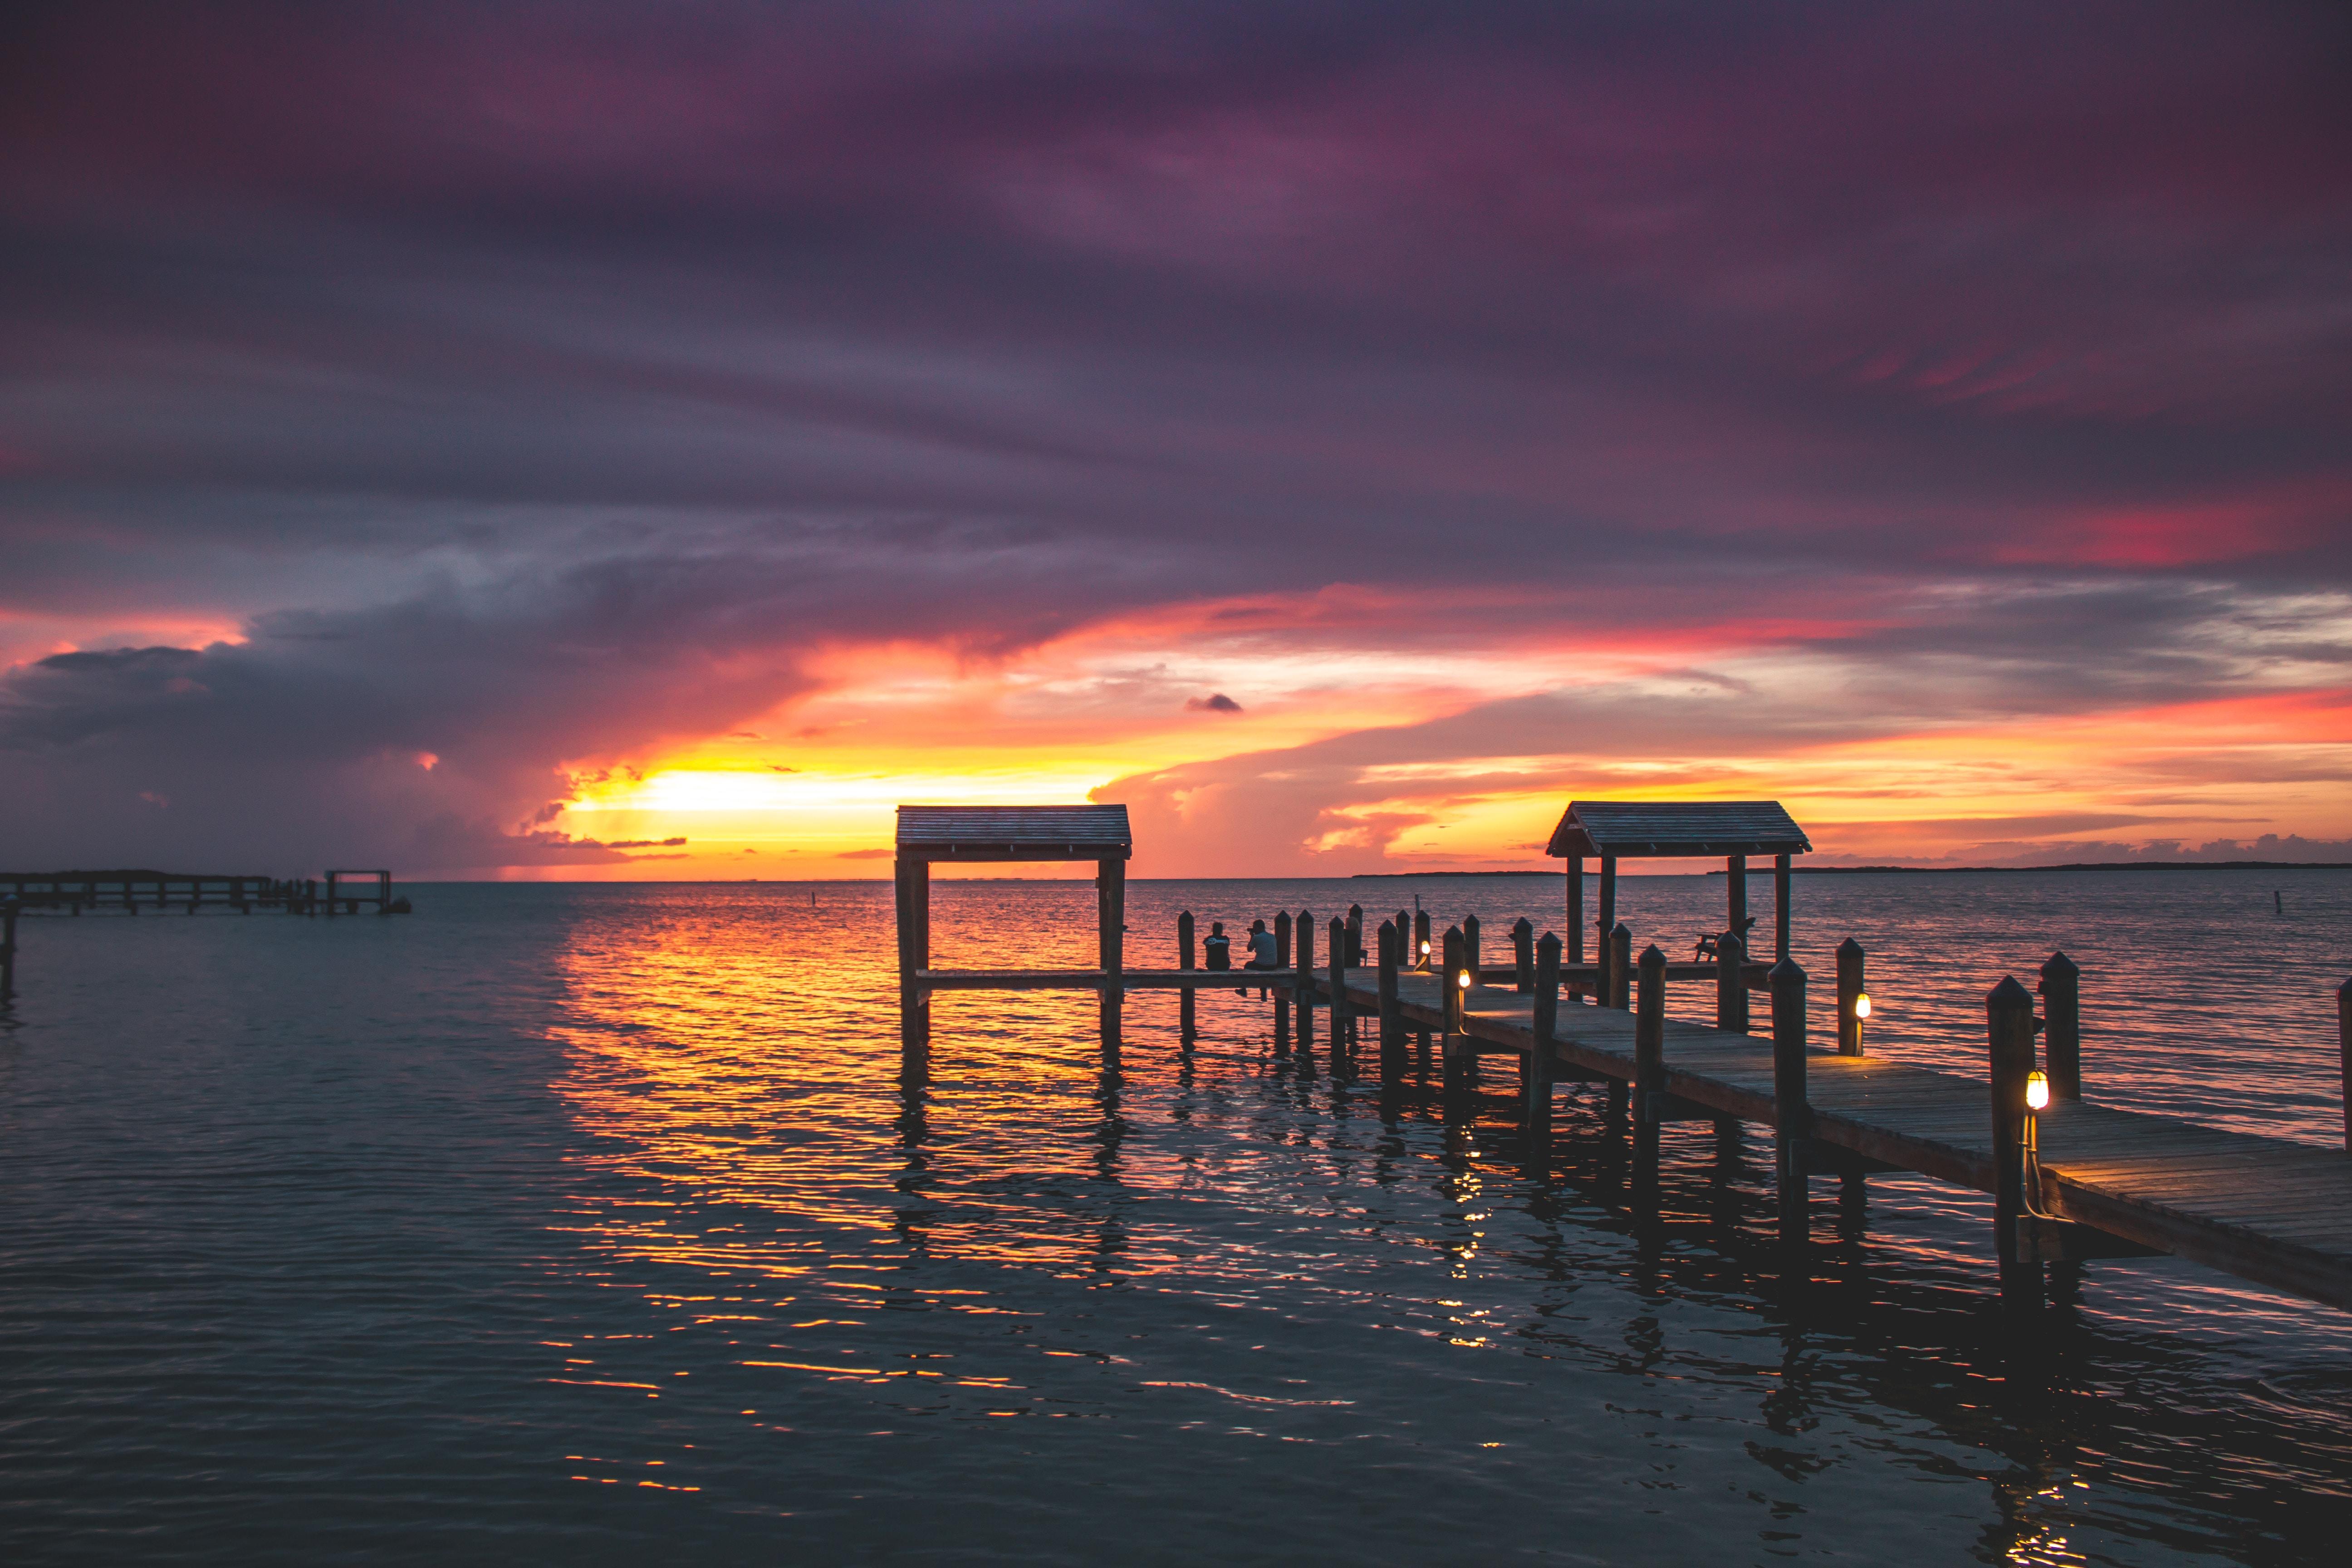 landscape photography of brown dock pier